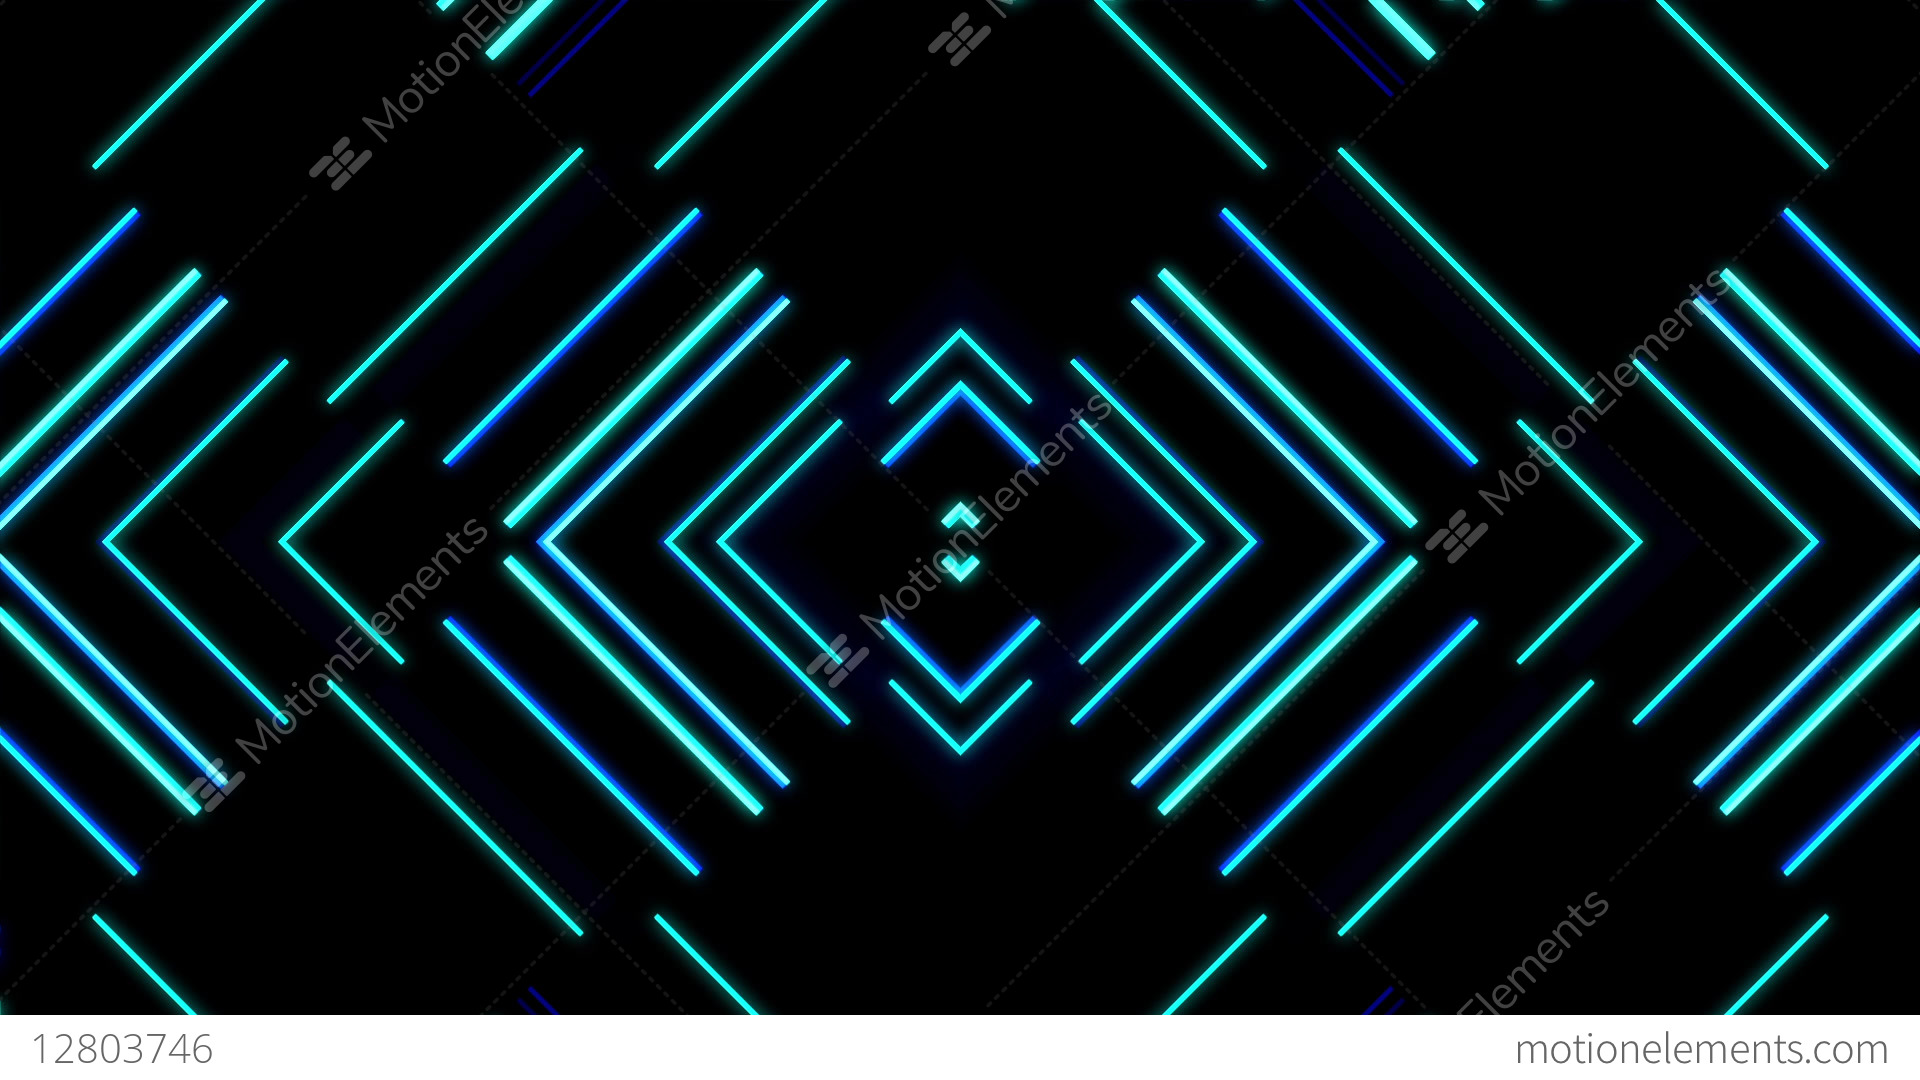 Neon Diamonds VJ Loop Stock Animation